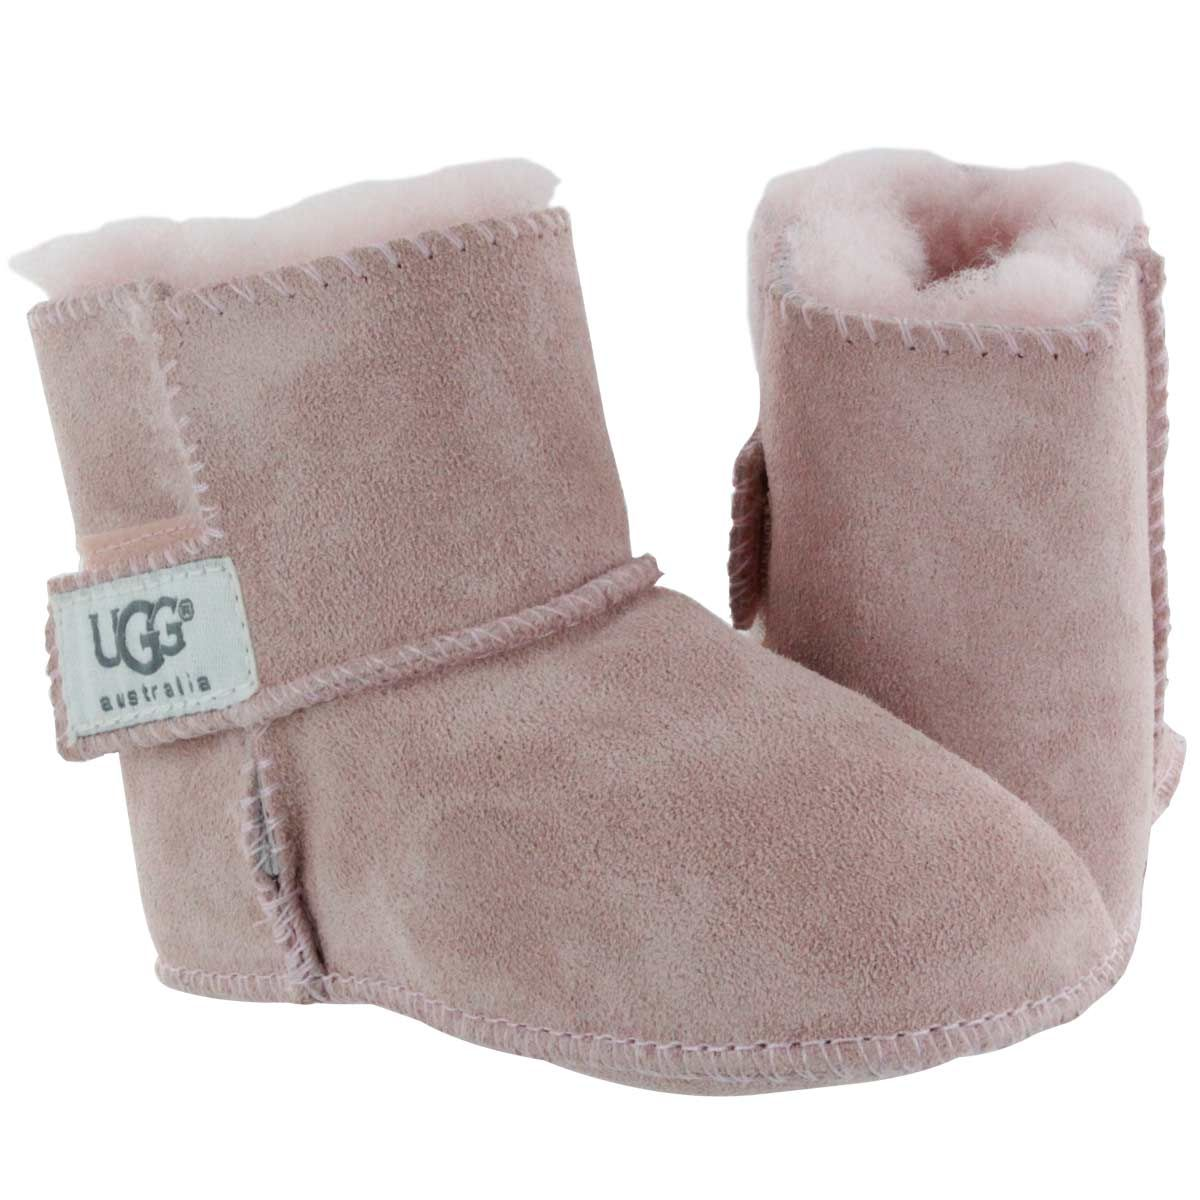 UGG Australia Infants' ERIN baby pink sheepskin slippers